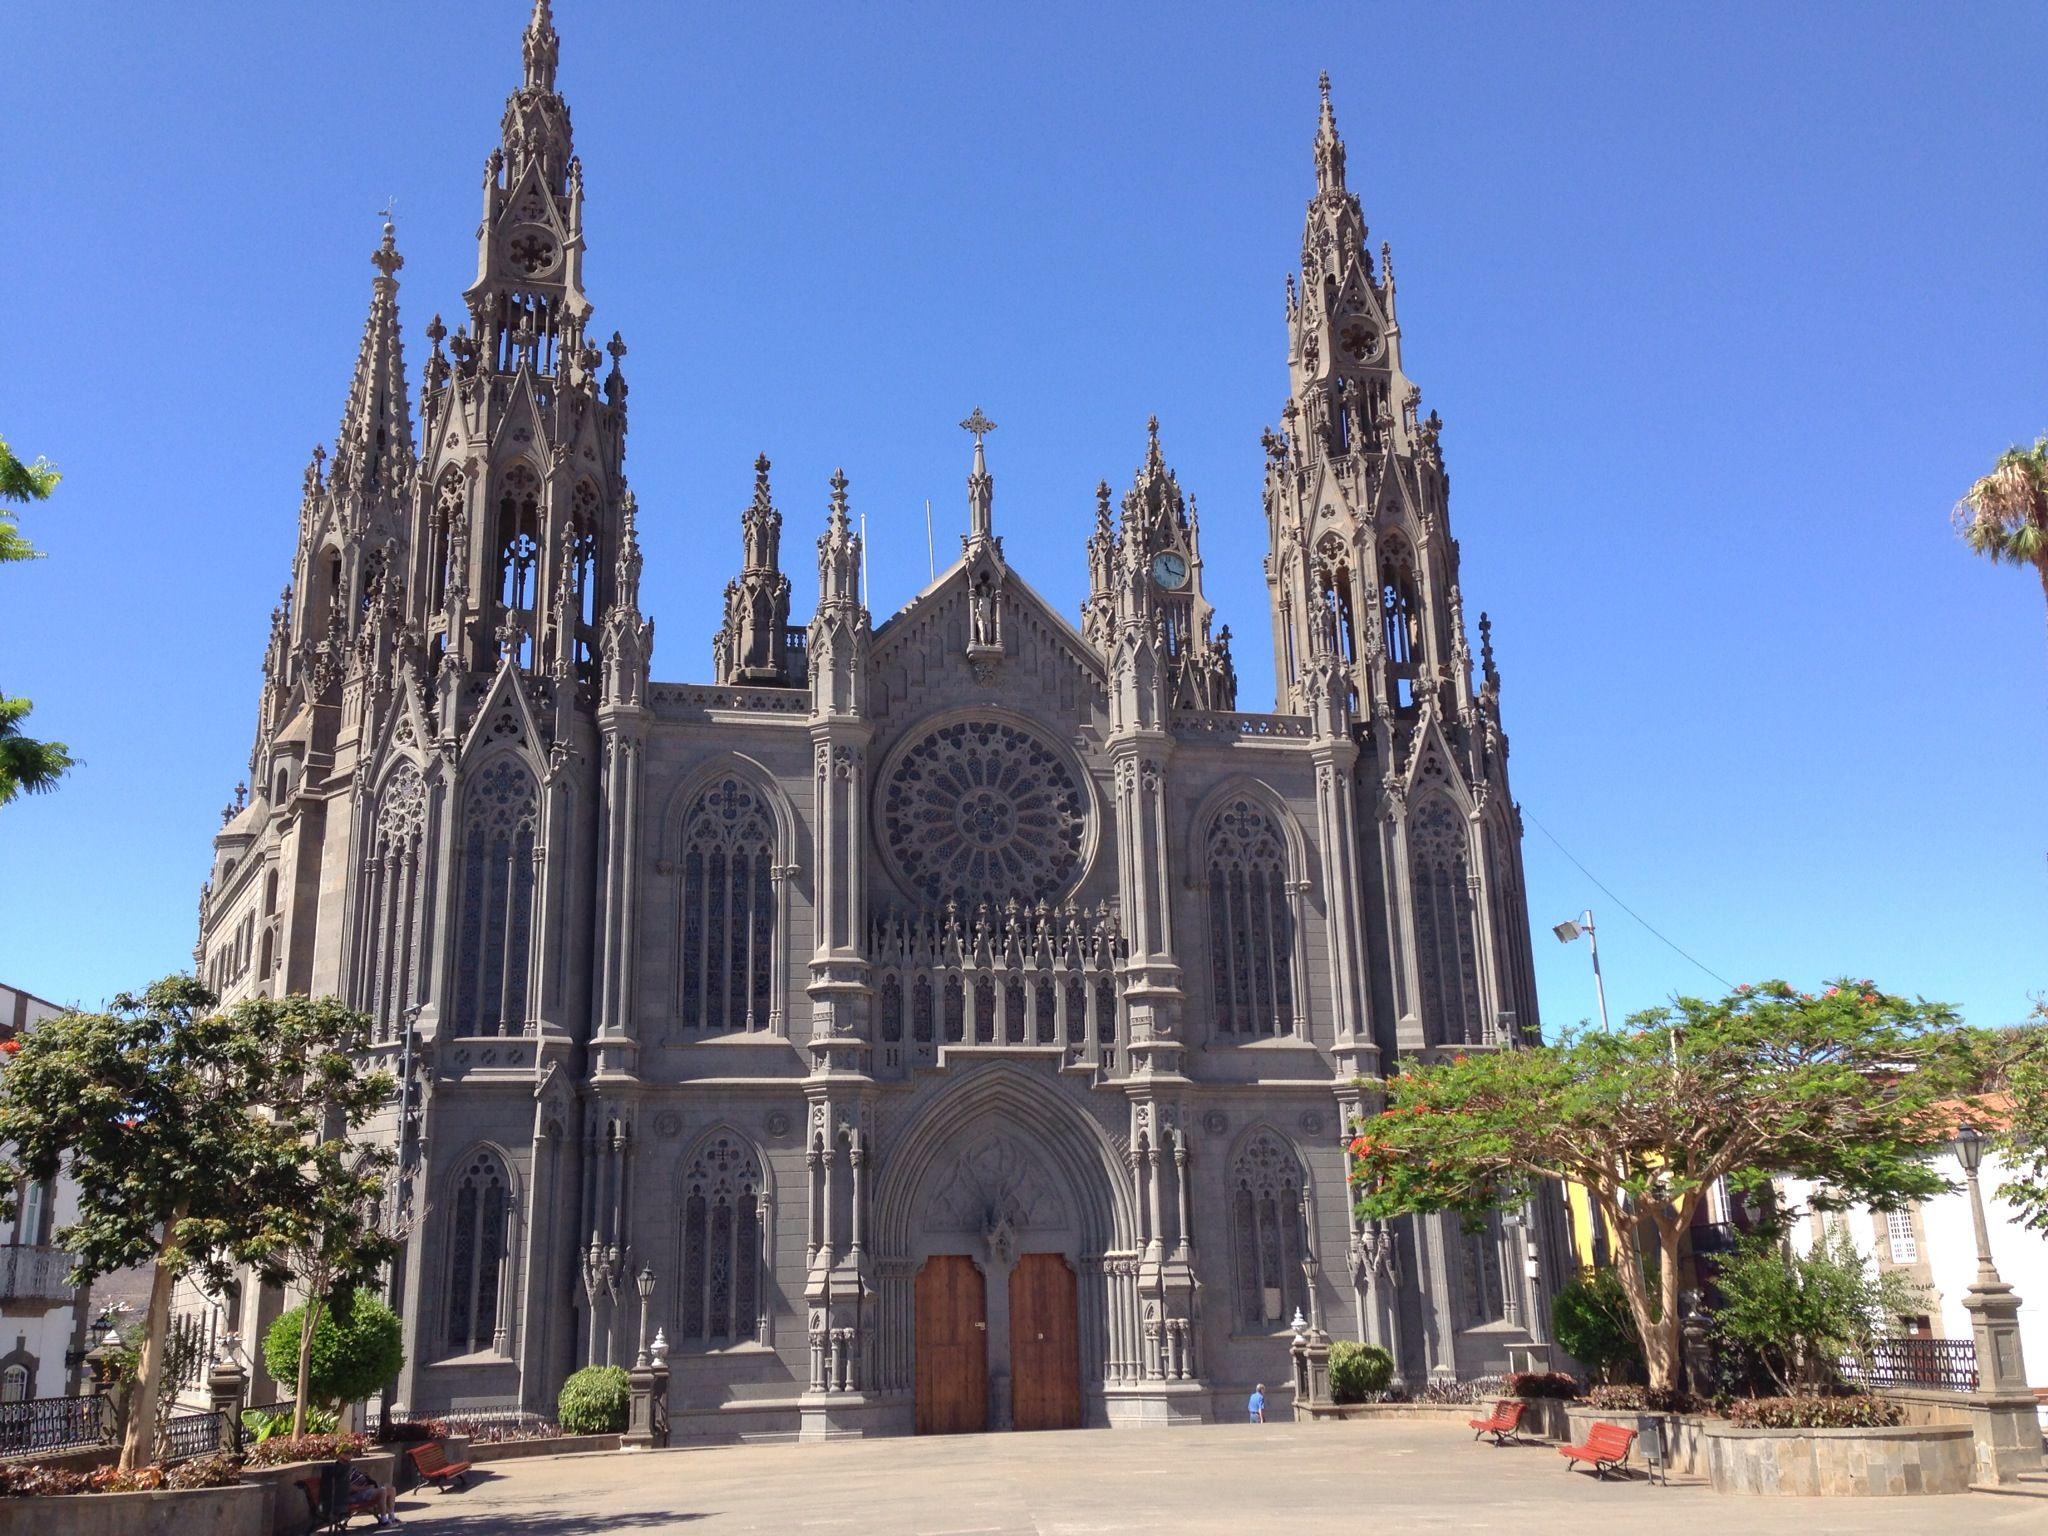 La impresionante iglesia neogótica de Arucas